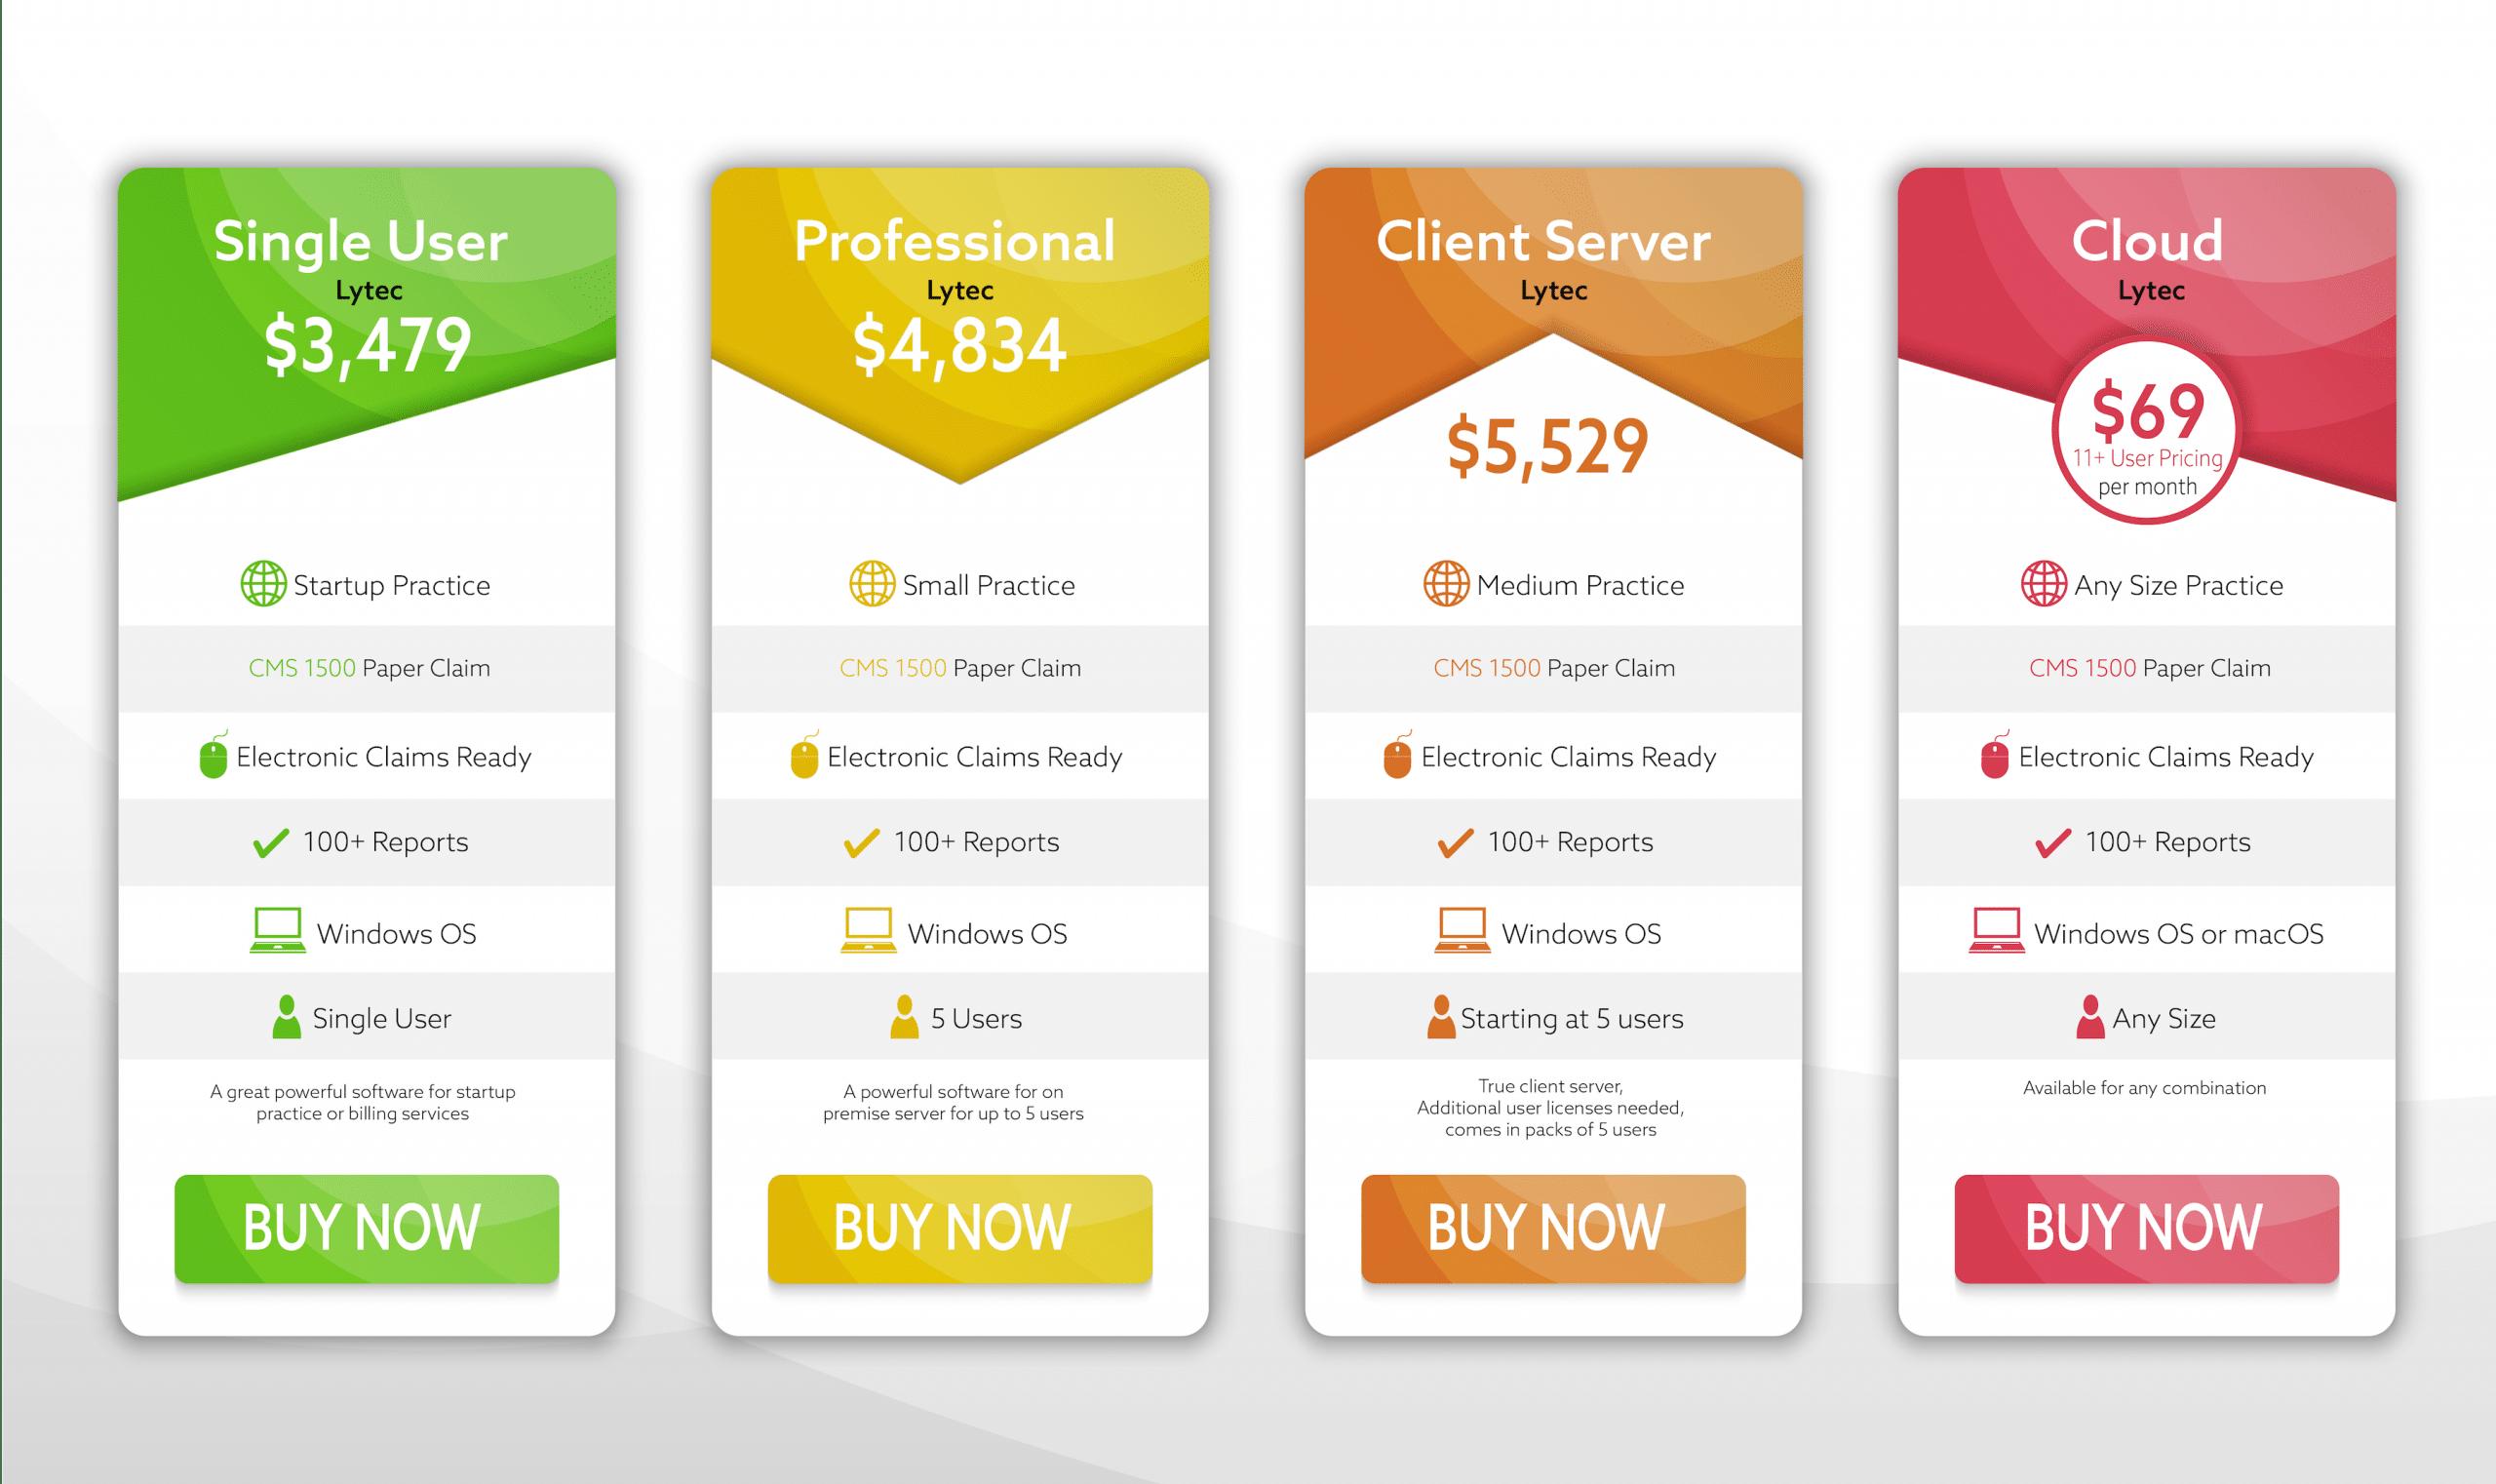 lytec price list